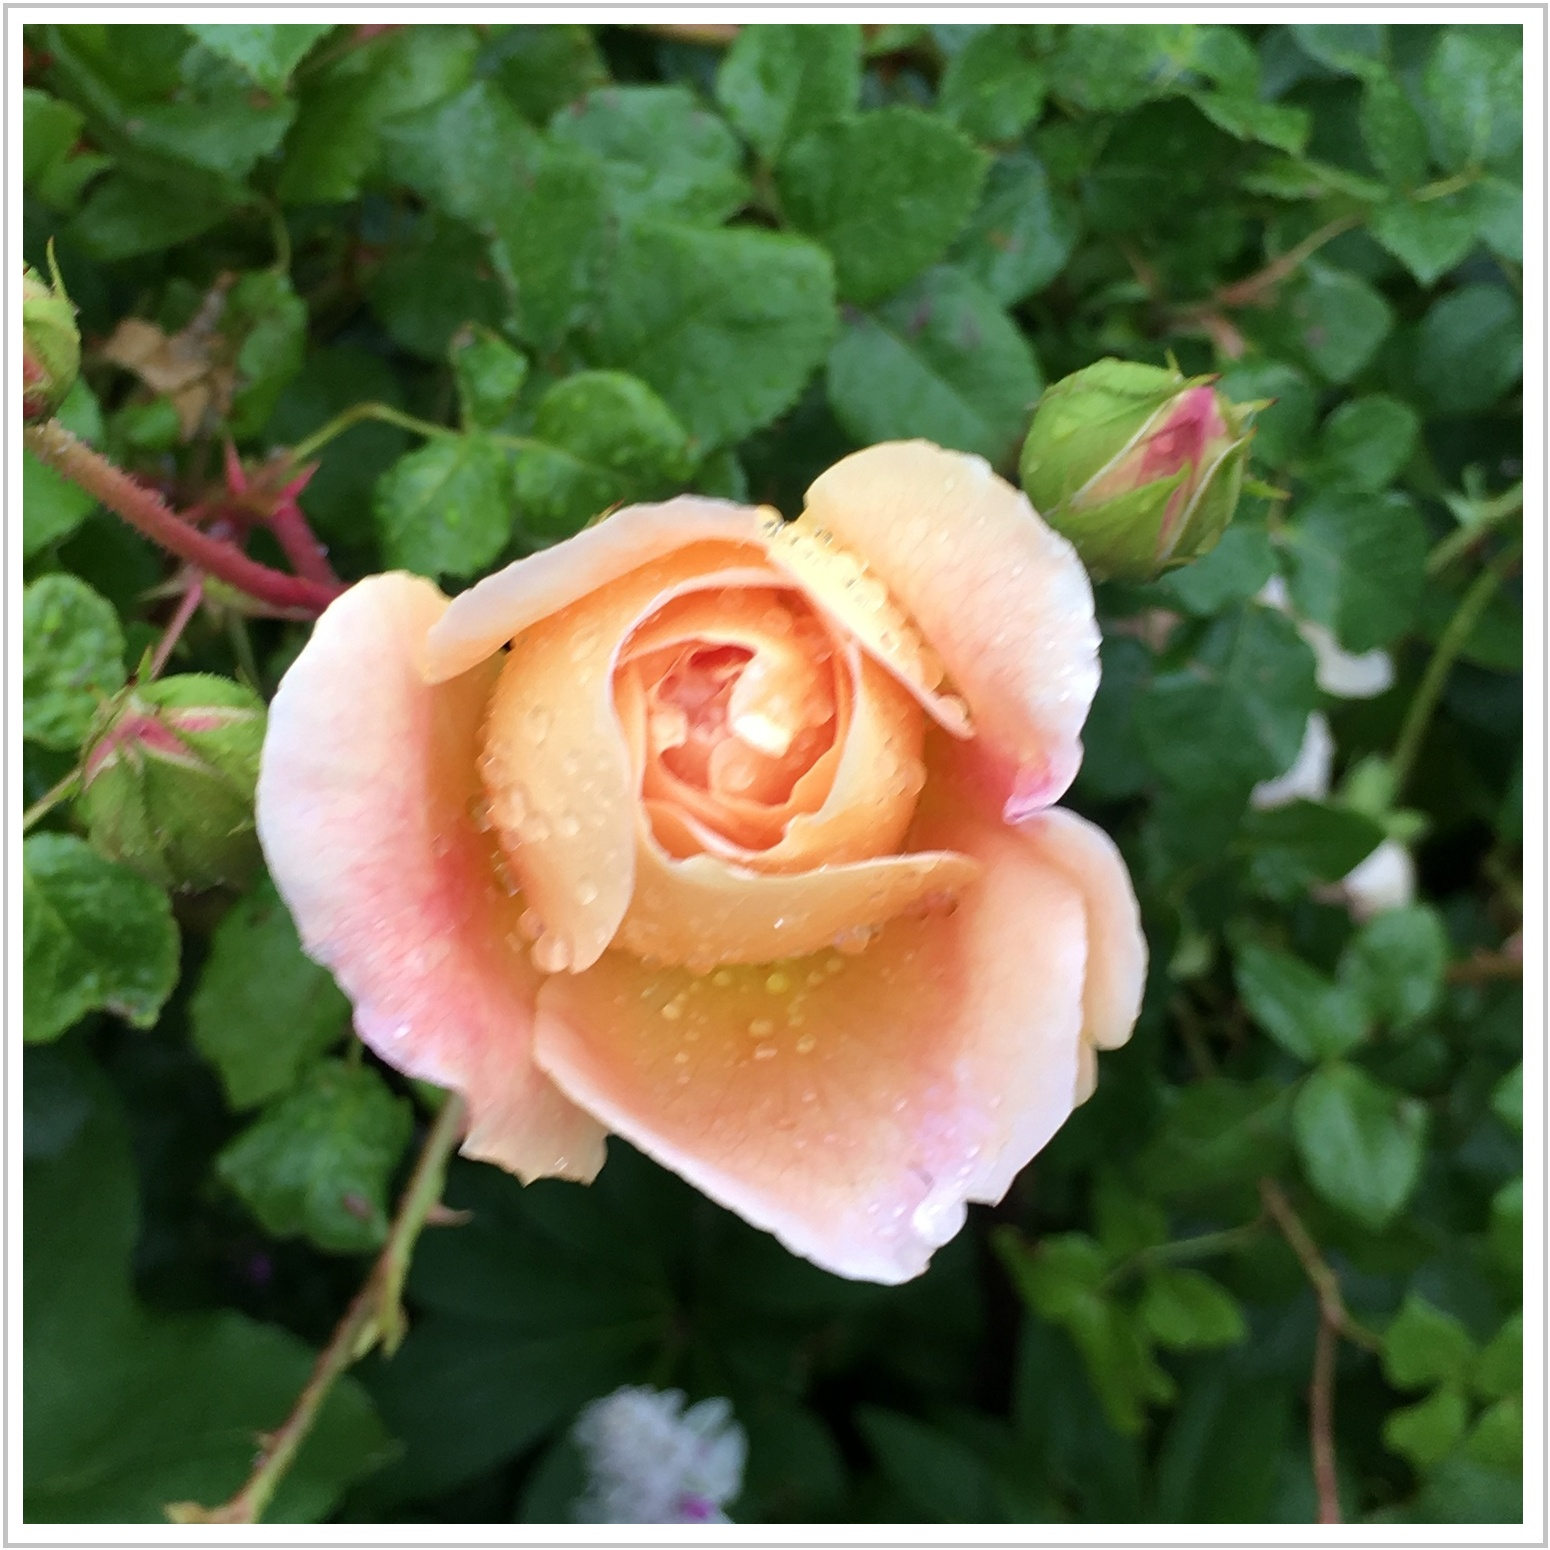 rose_5_623.jpg